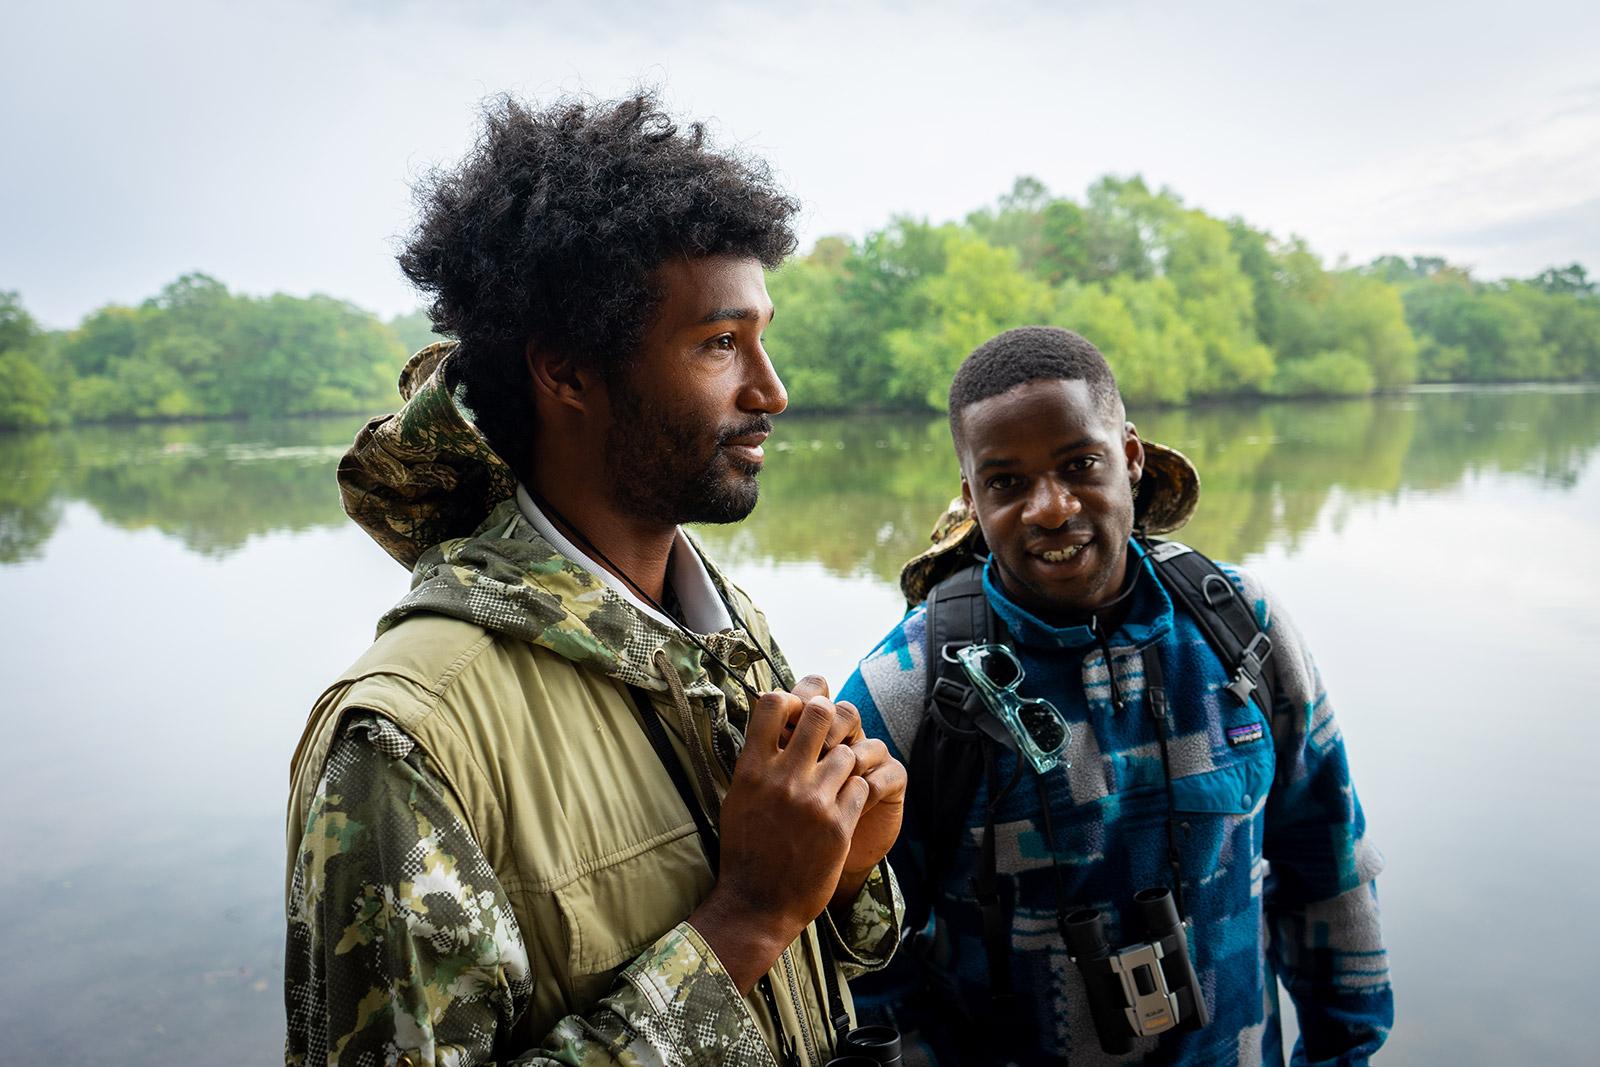 Flock Together founders Ollie Olanipekun and Nadeem Perera